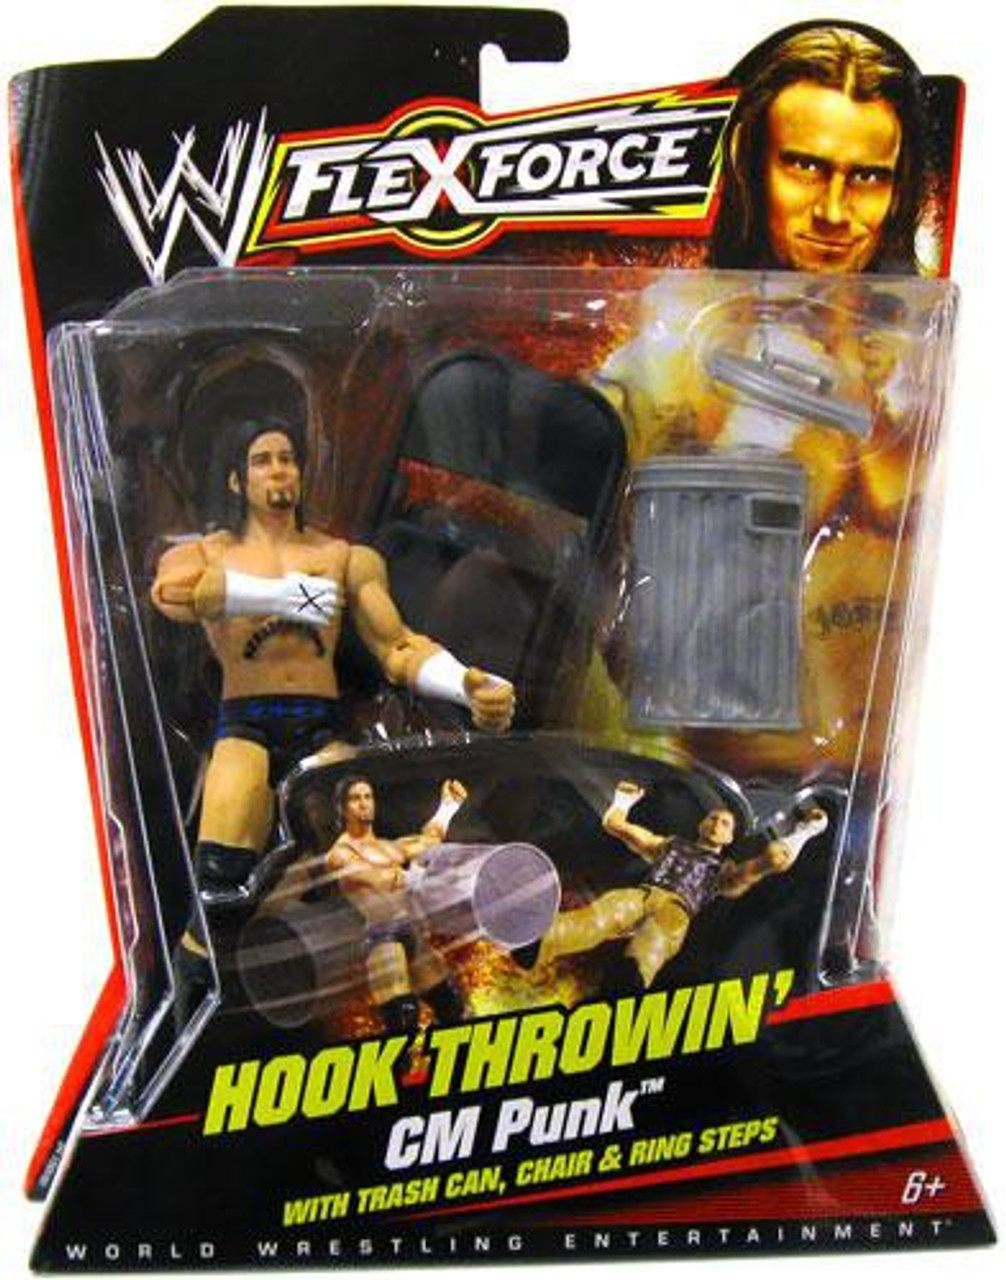 WWE Wrestling FlexForce Series 1 Hook Throwin' CM Punk Action Figure